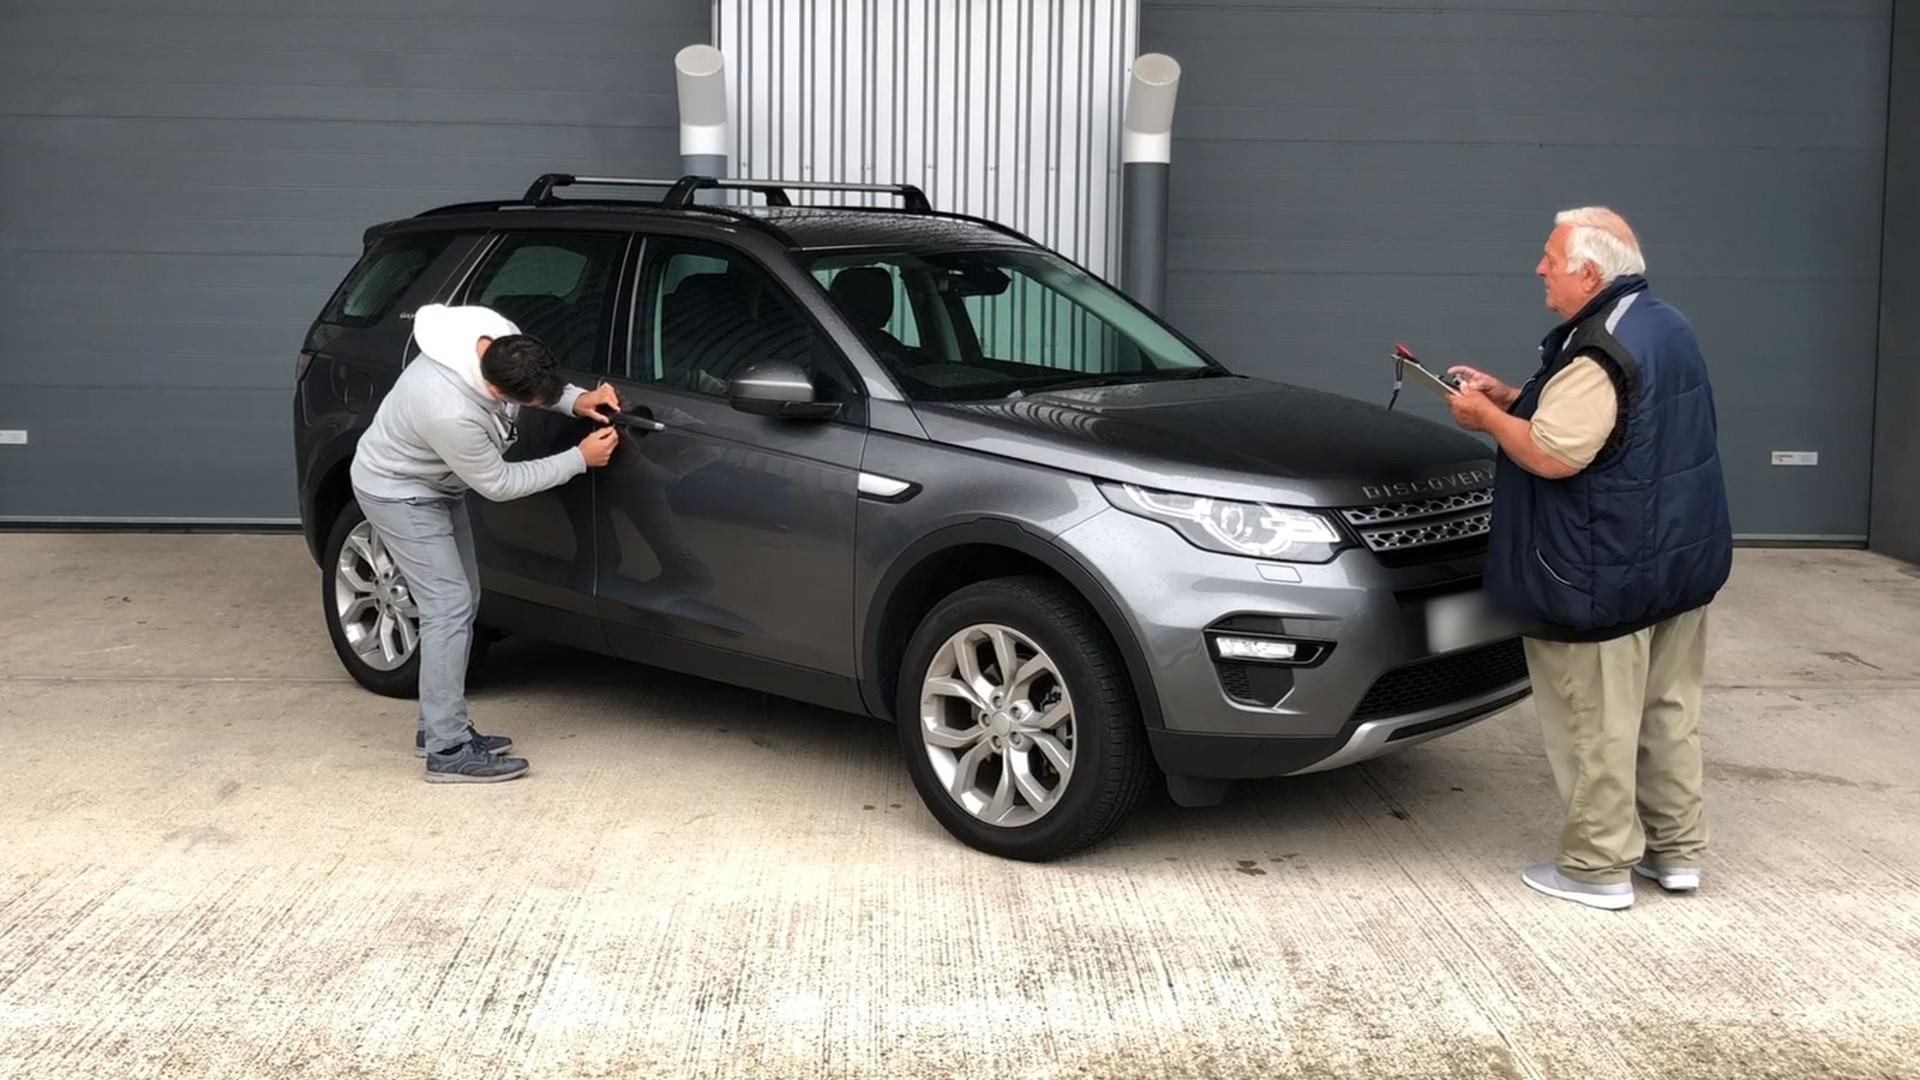 Investigating keyless car theft